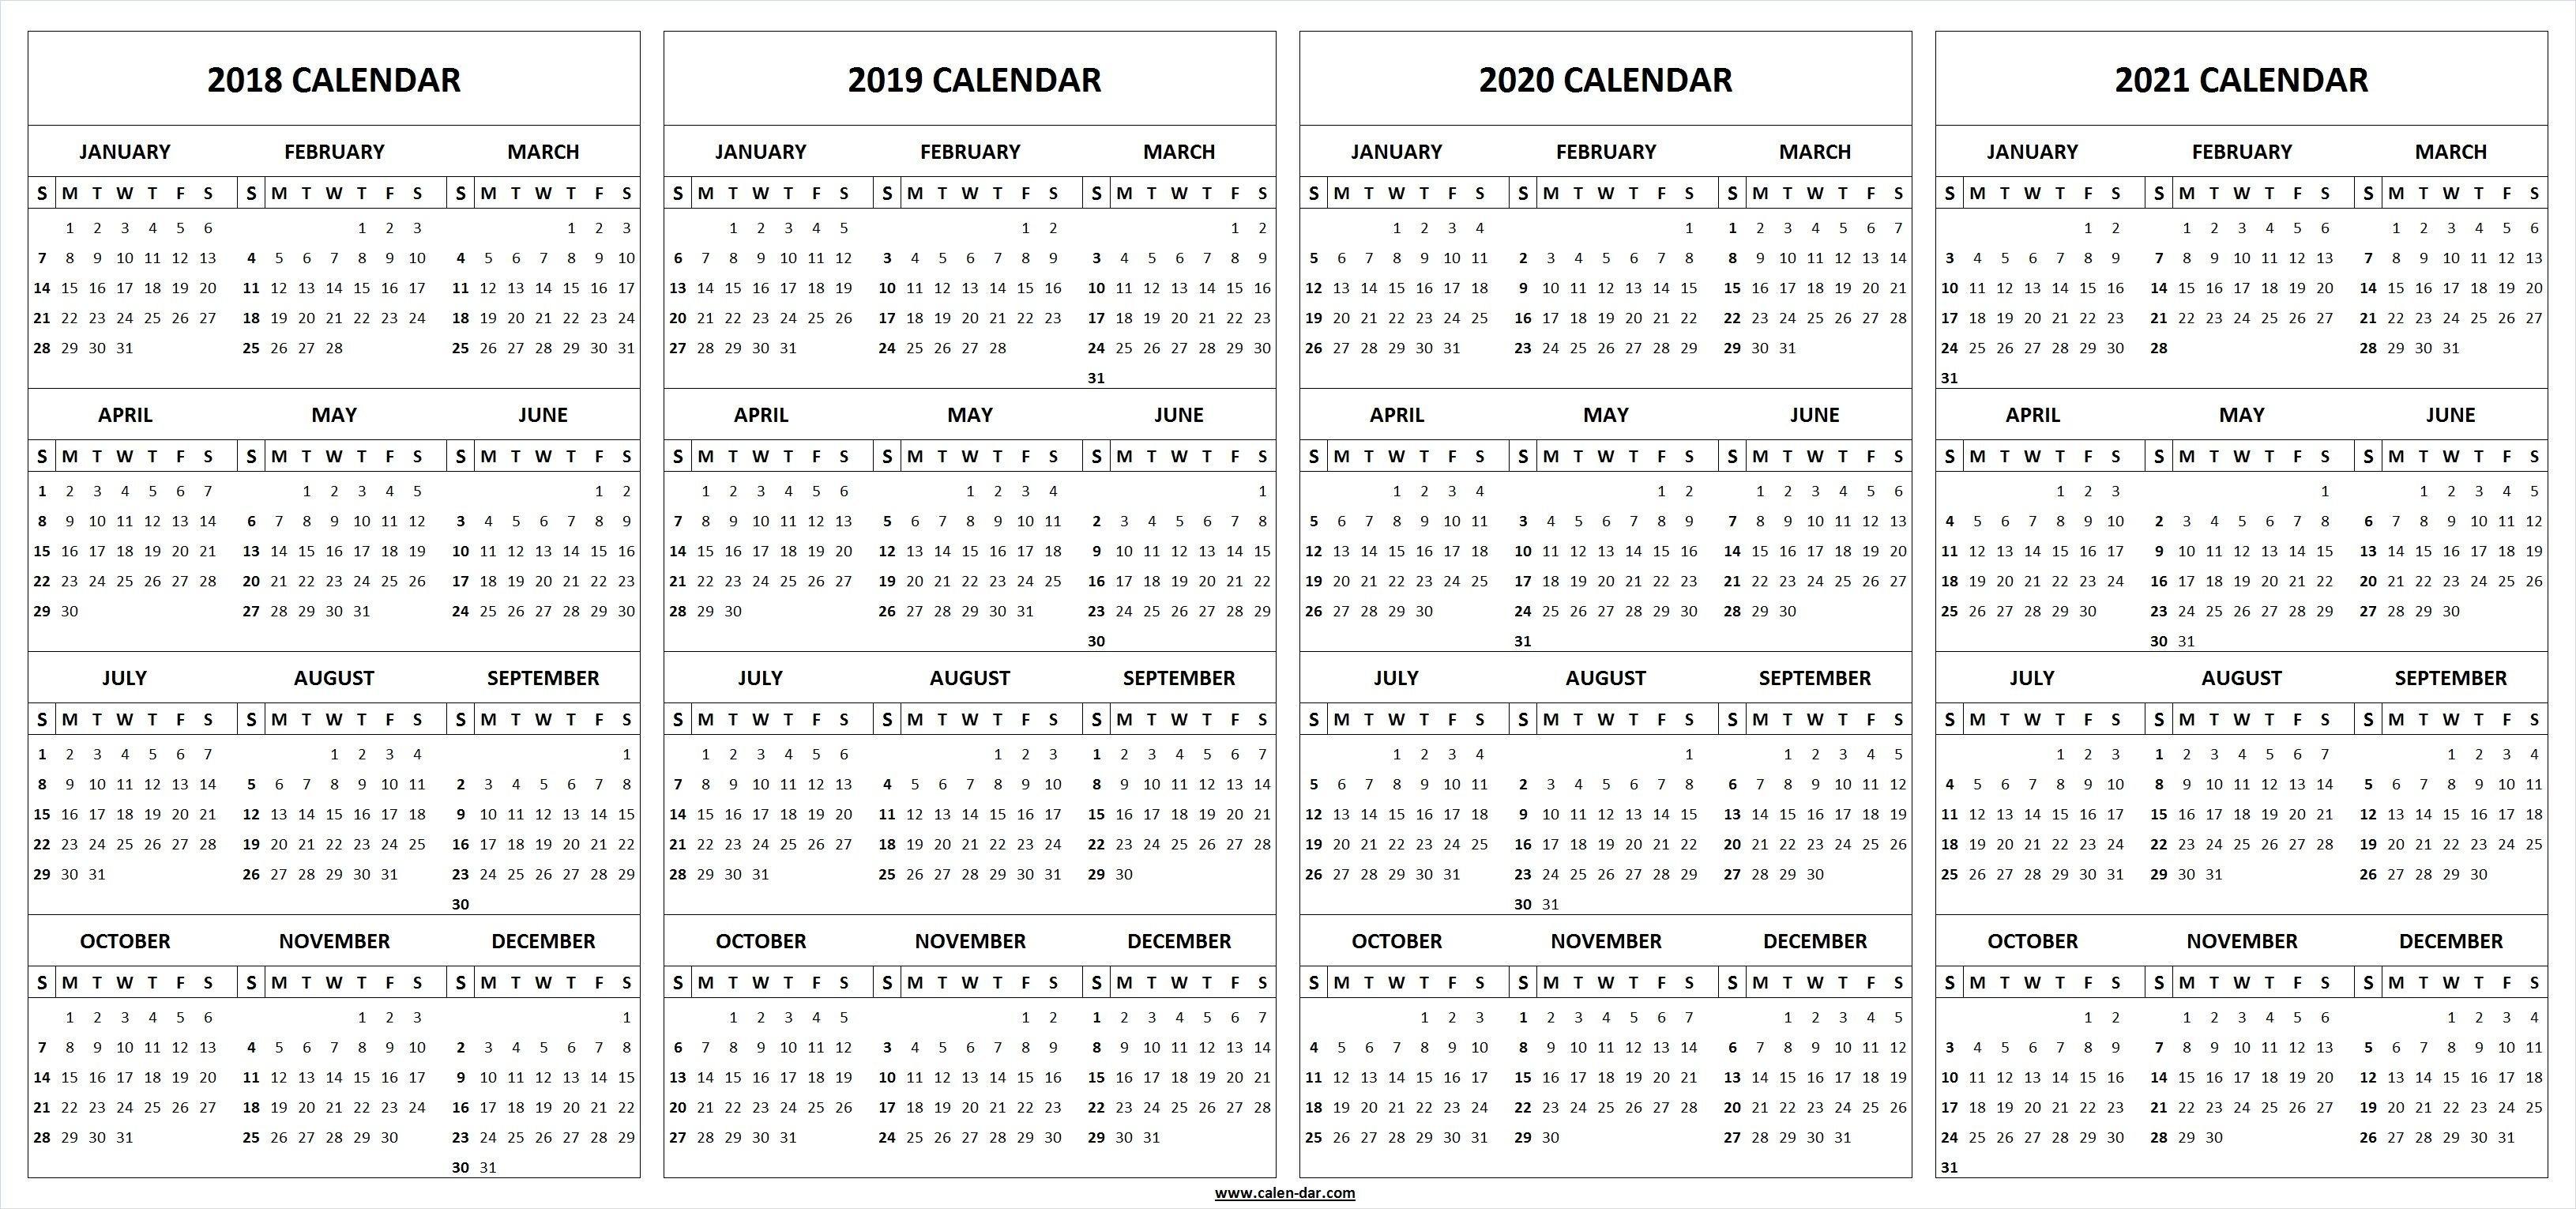 4 Four Year 2018 2019 2020 2021 Calendar Printable Template 4 Year Calendar 2019 To 2022 Printable